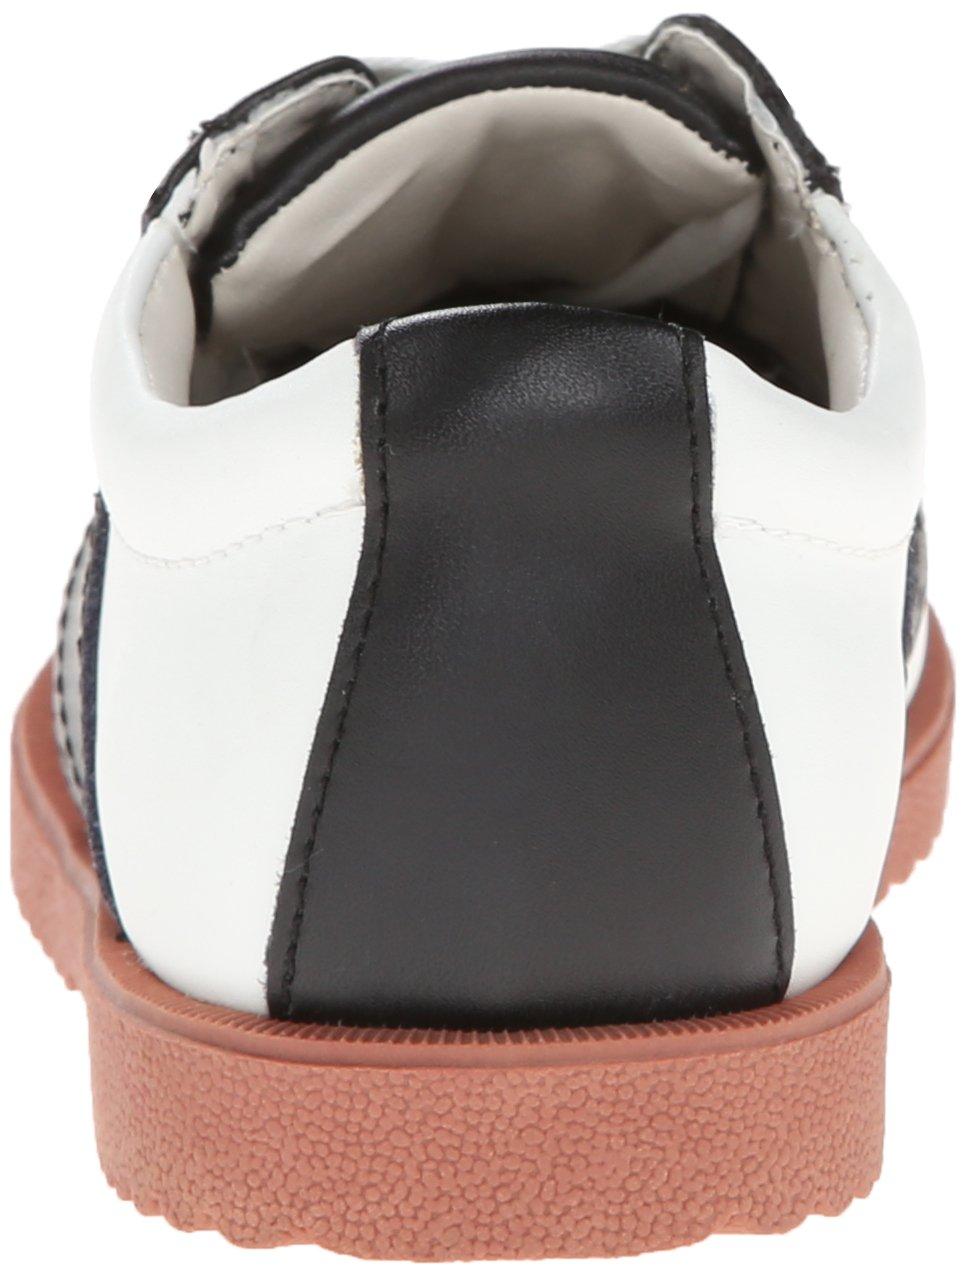 Academie Gear Honor Roll Saddle Shoe (Toddler/Little Kid/Big Kid),White/Black,4 W US Big Kid by Academie Gear (Image #2)